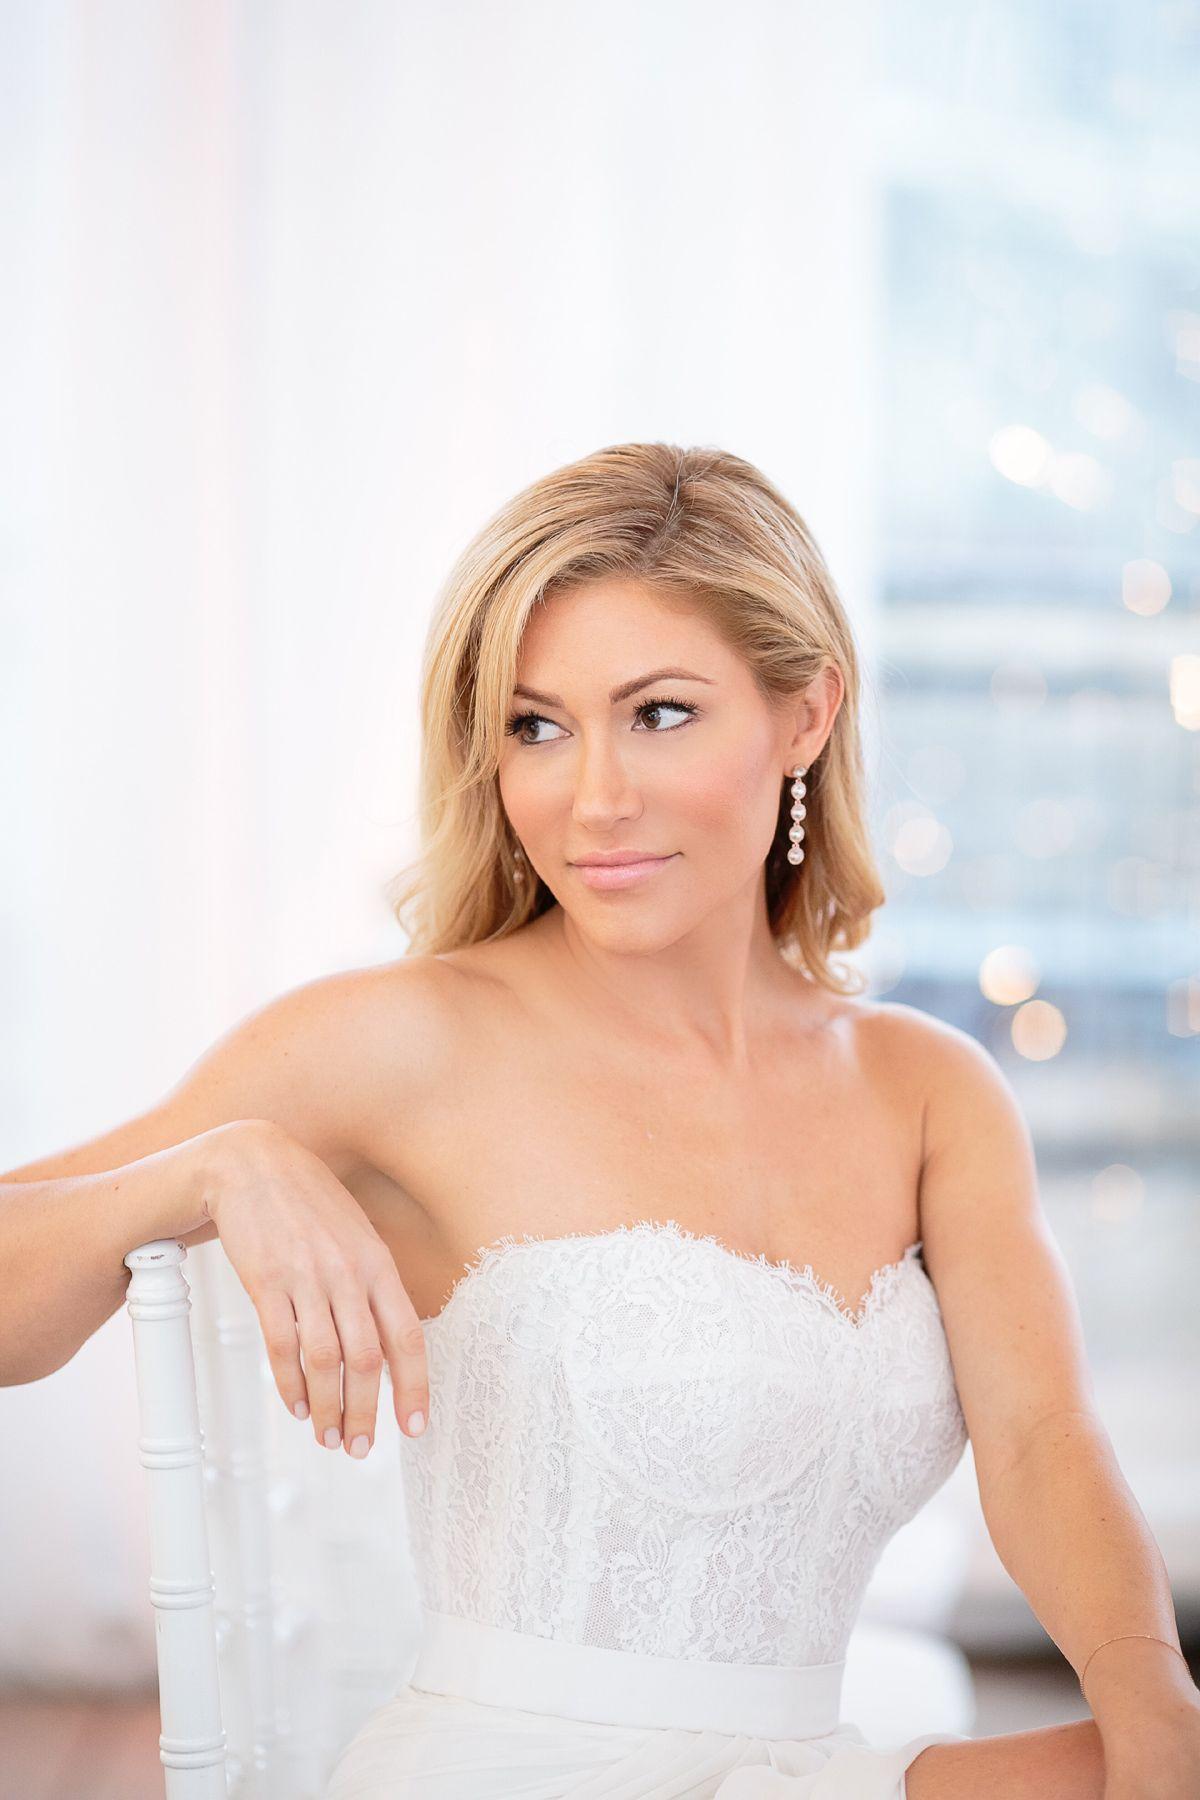 jackie johnson | wedding hair & makeup photos | the brid